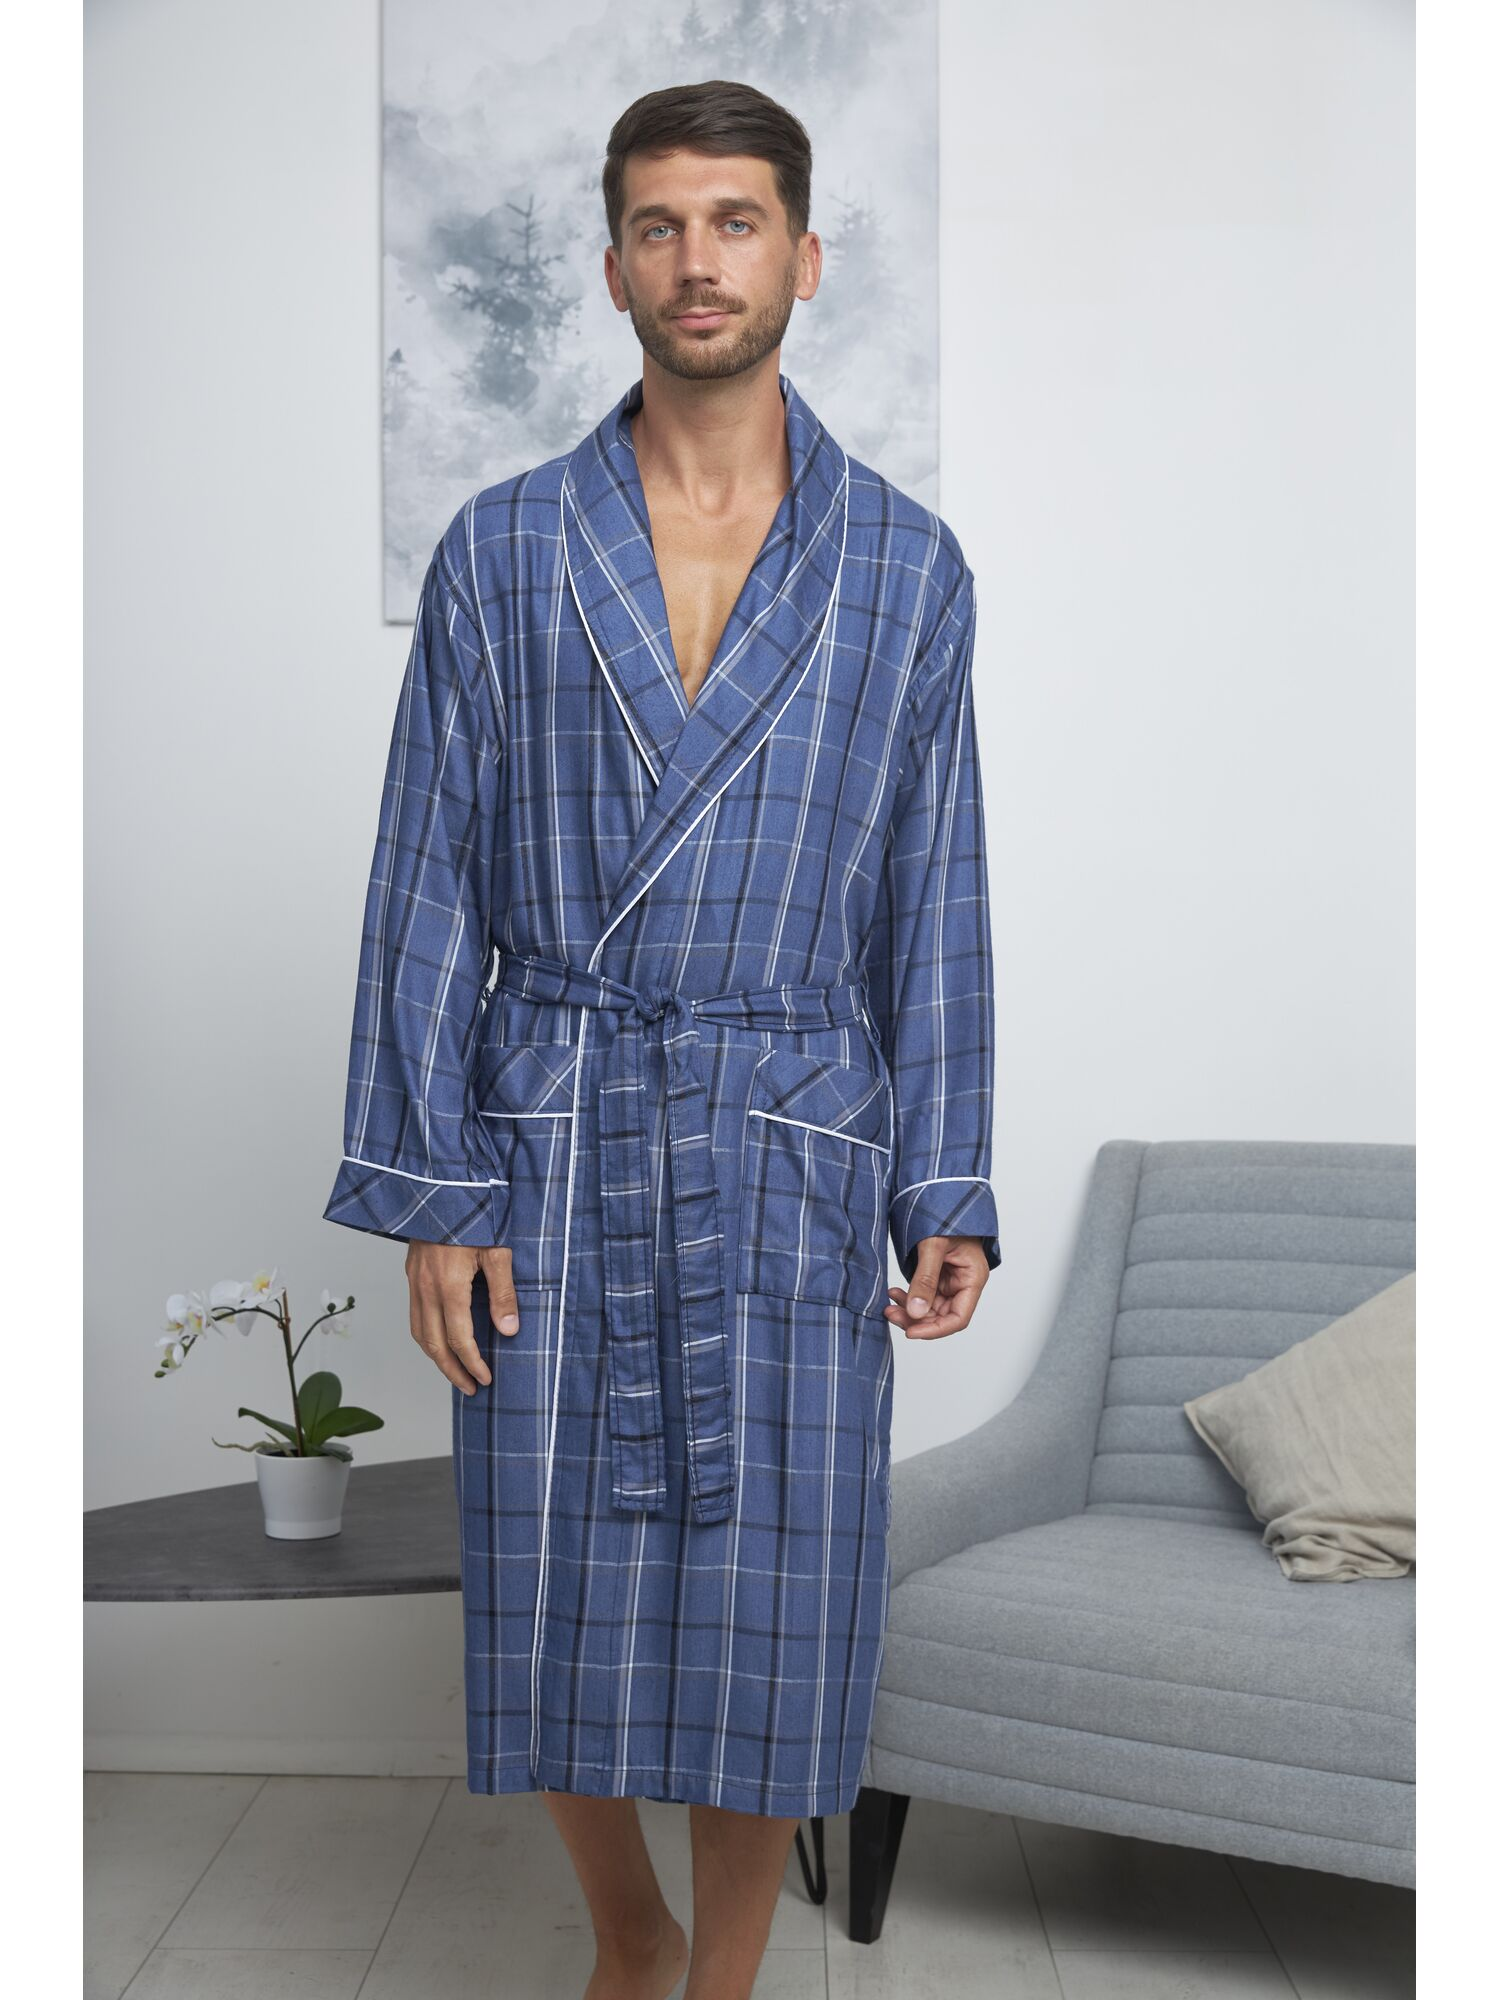 Халат мужской бамбуковый ROME голубой, VIEN